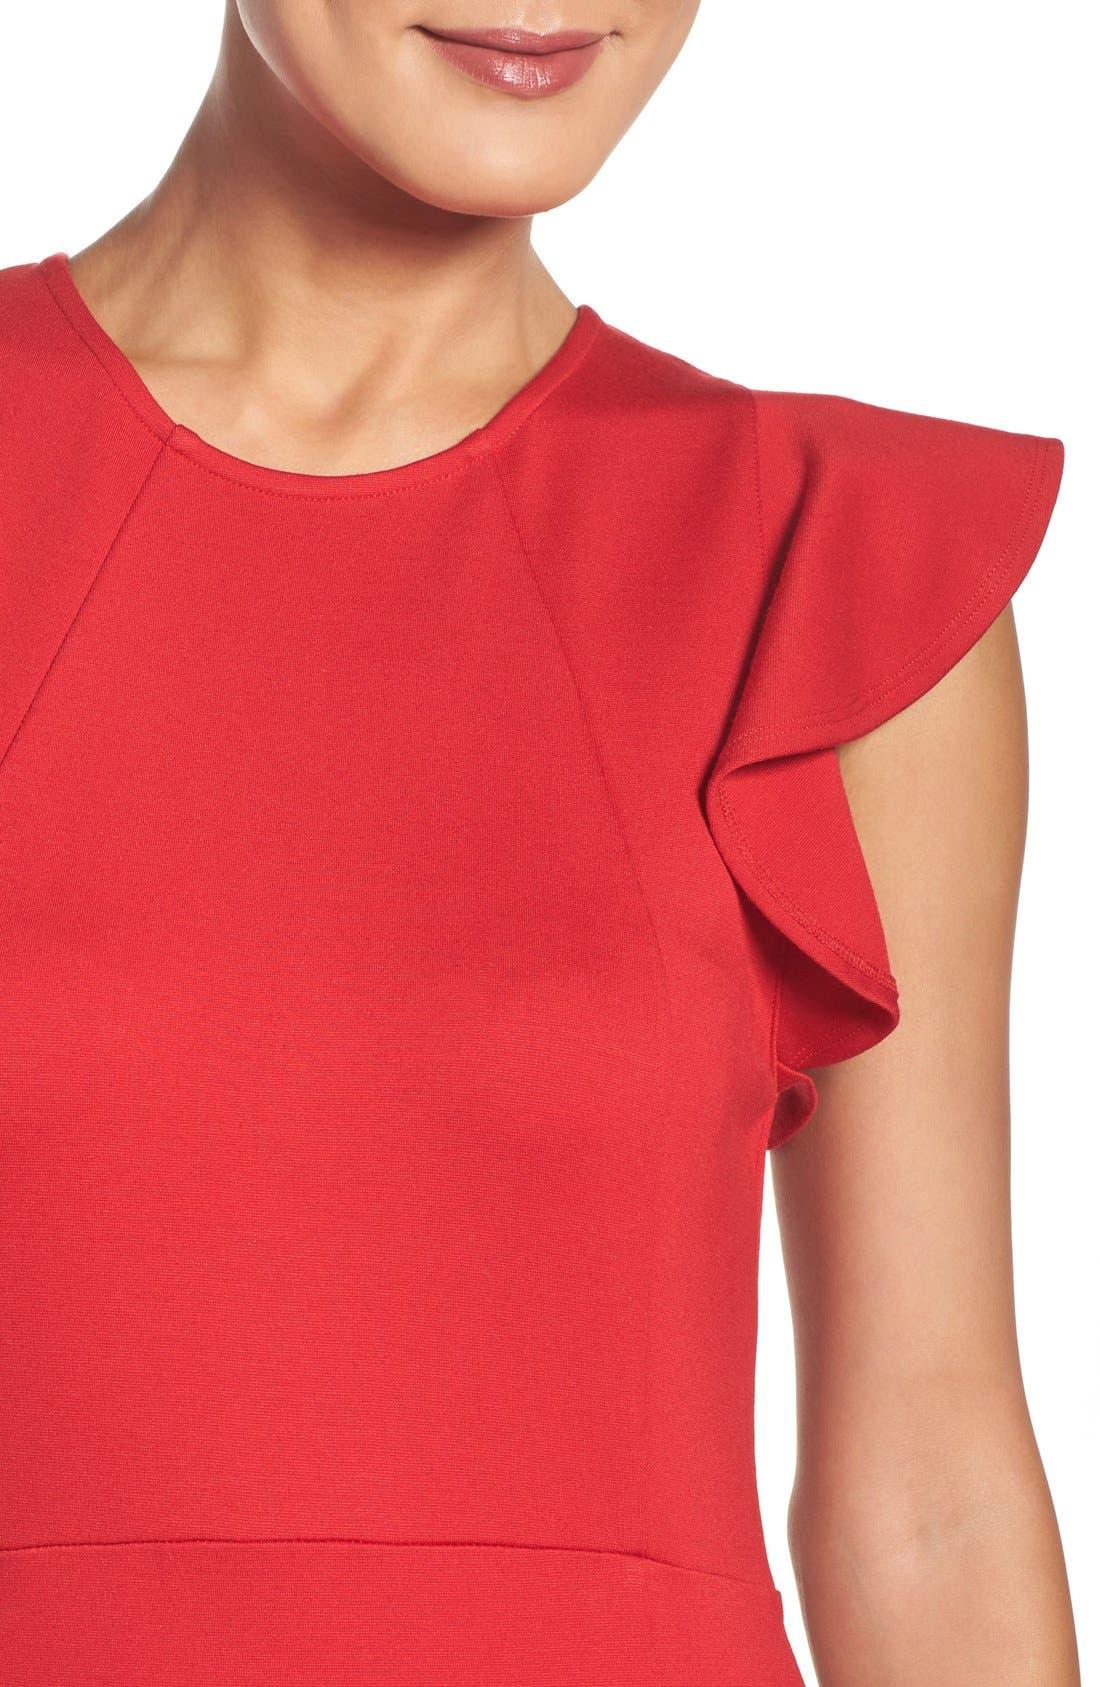 Alternate Image 4  - Felicity & Coco Capriana Ruffle Sheath Dress (Regular & Petite) (Nordstrom Exclusive)